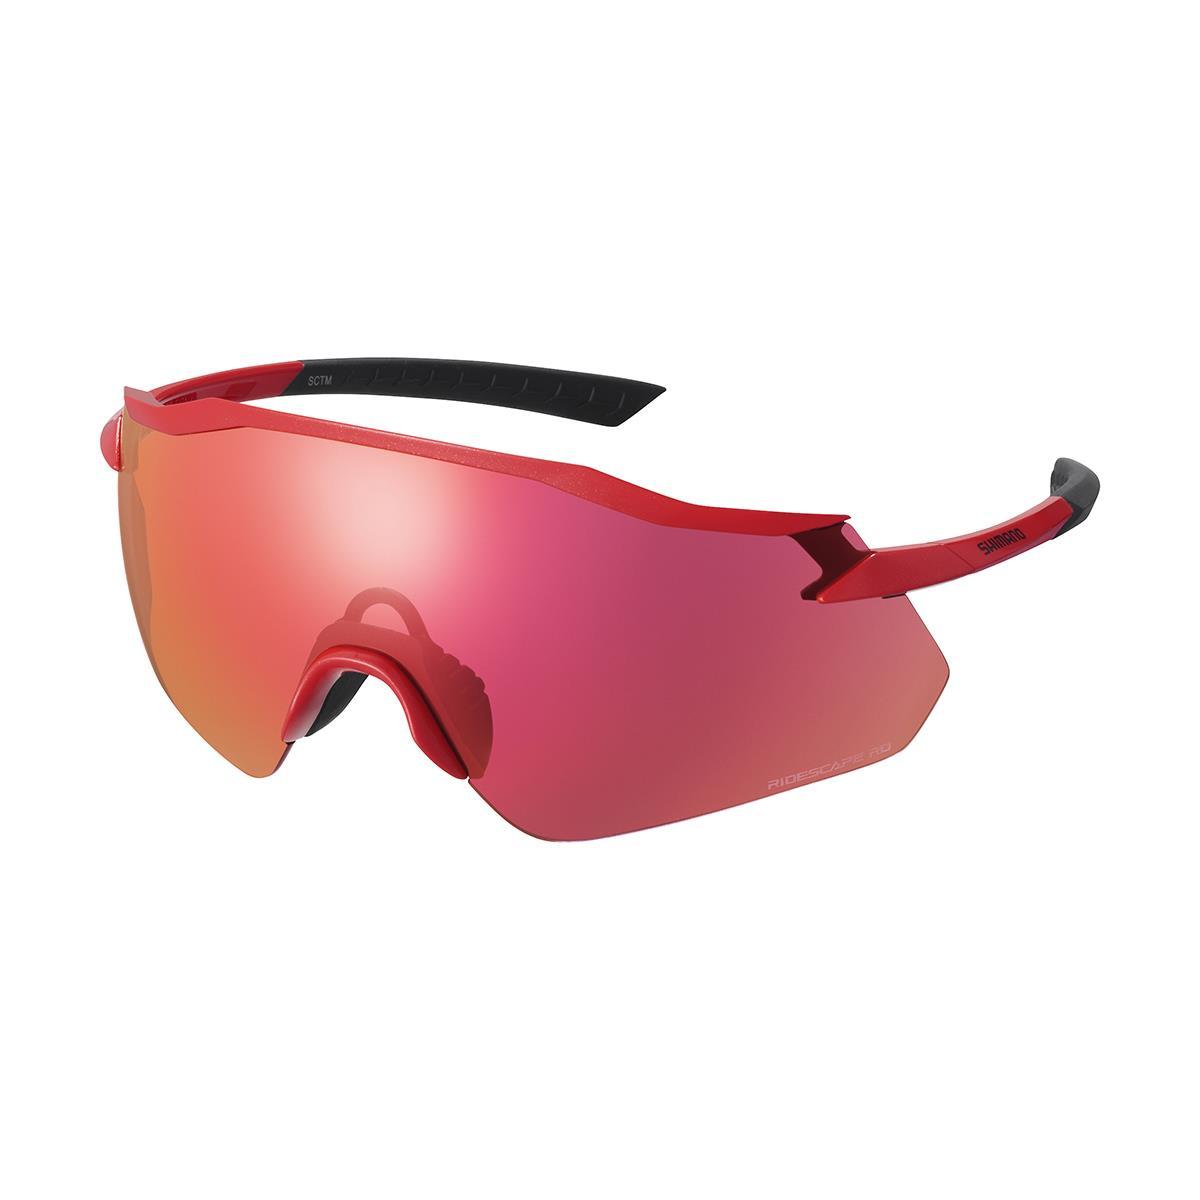 Equinox Sunglasses Red / Ridescape RD Road Lens